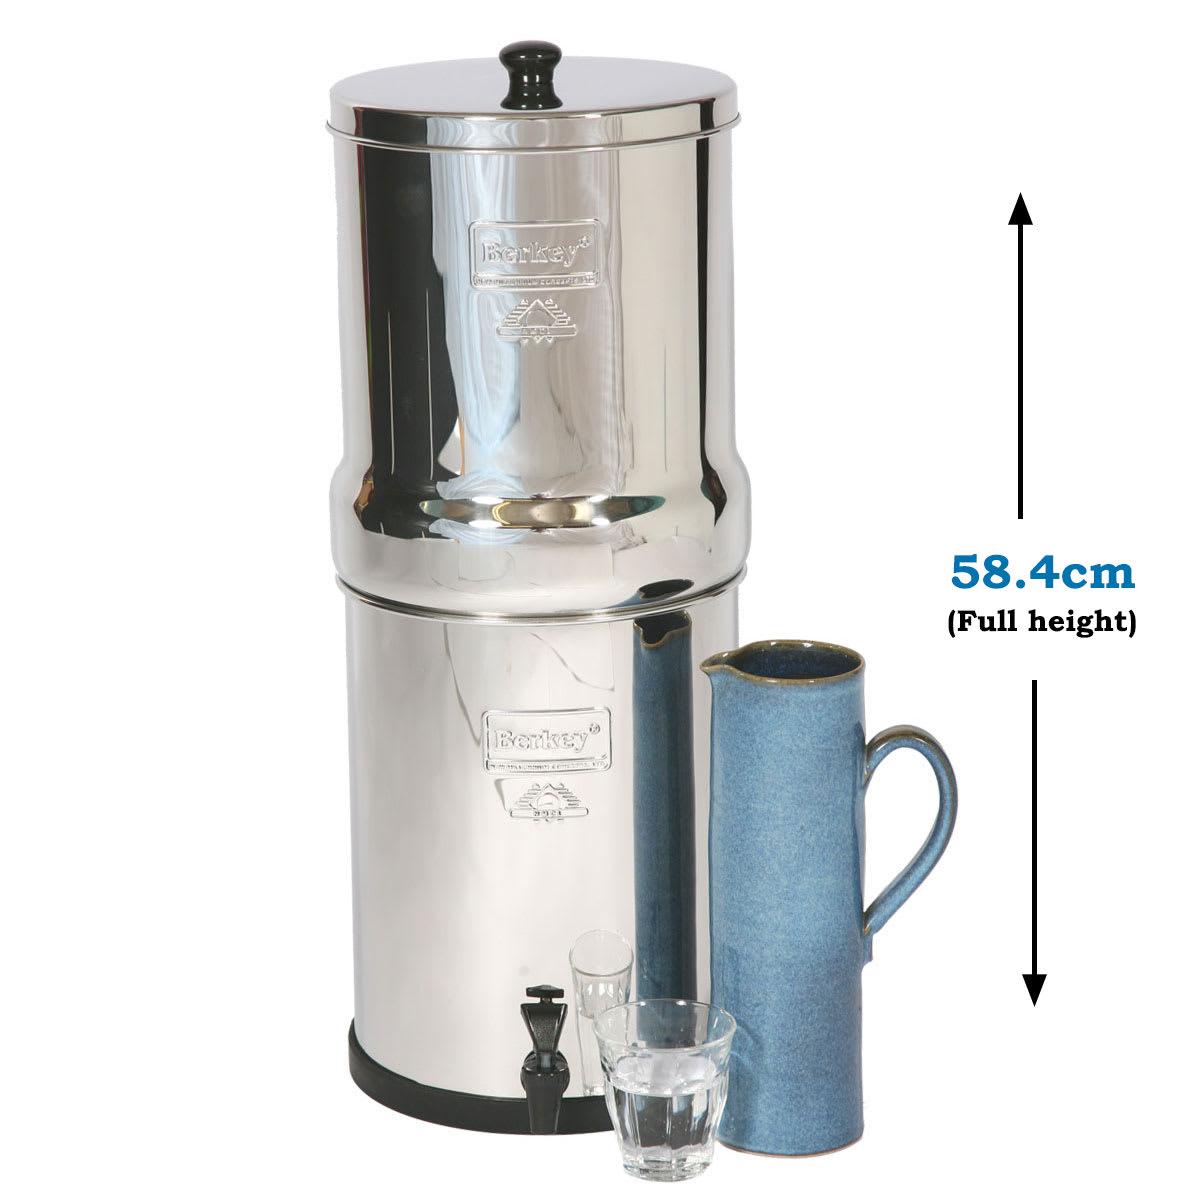 Water Filters and Purifiers - Berkey Water Filters Europe : kolfilterfläkt test : Inredning